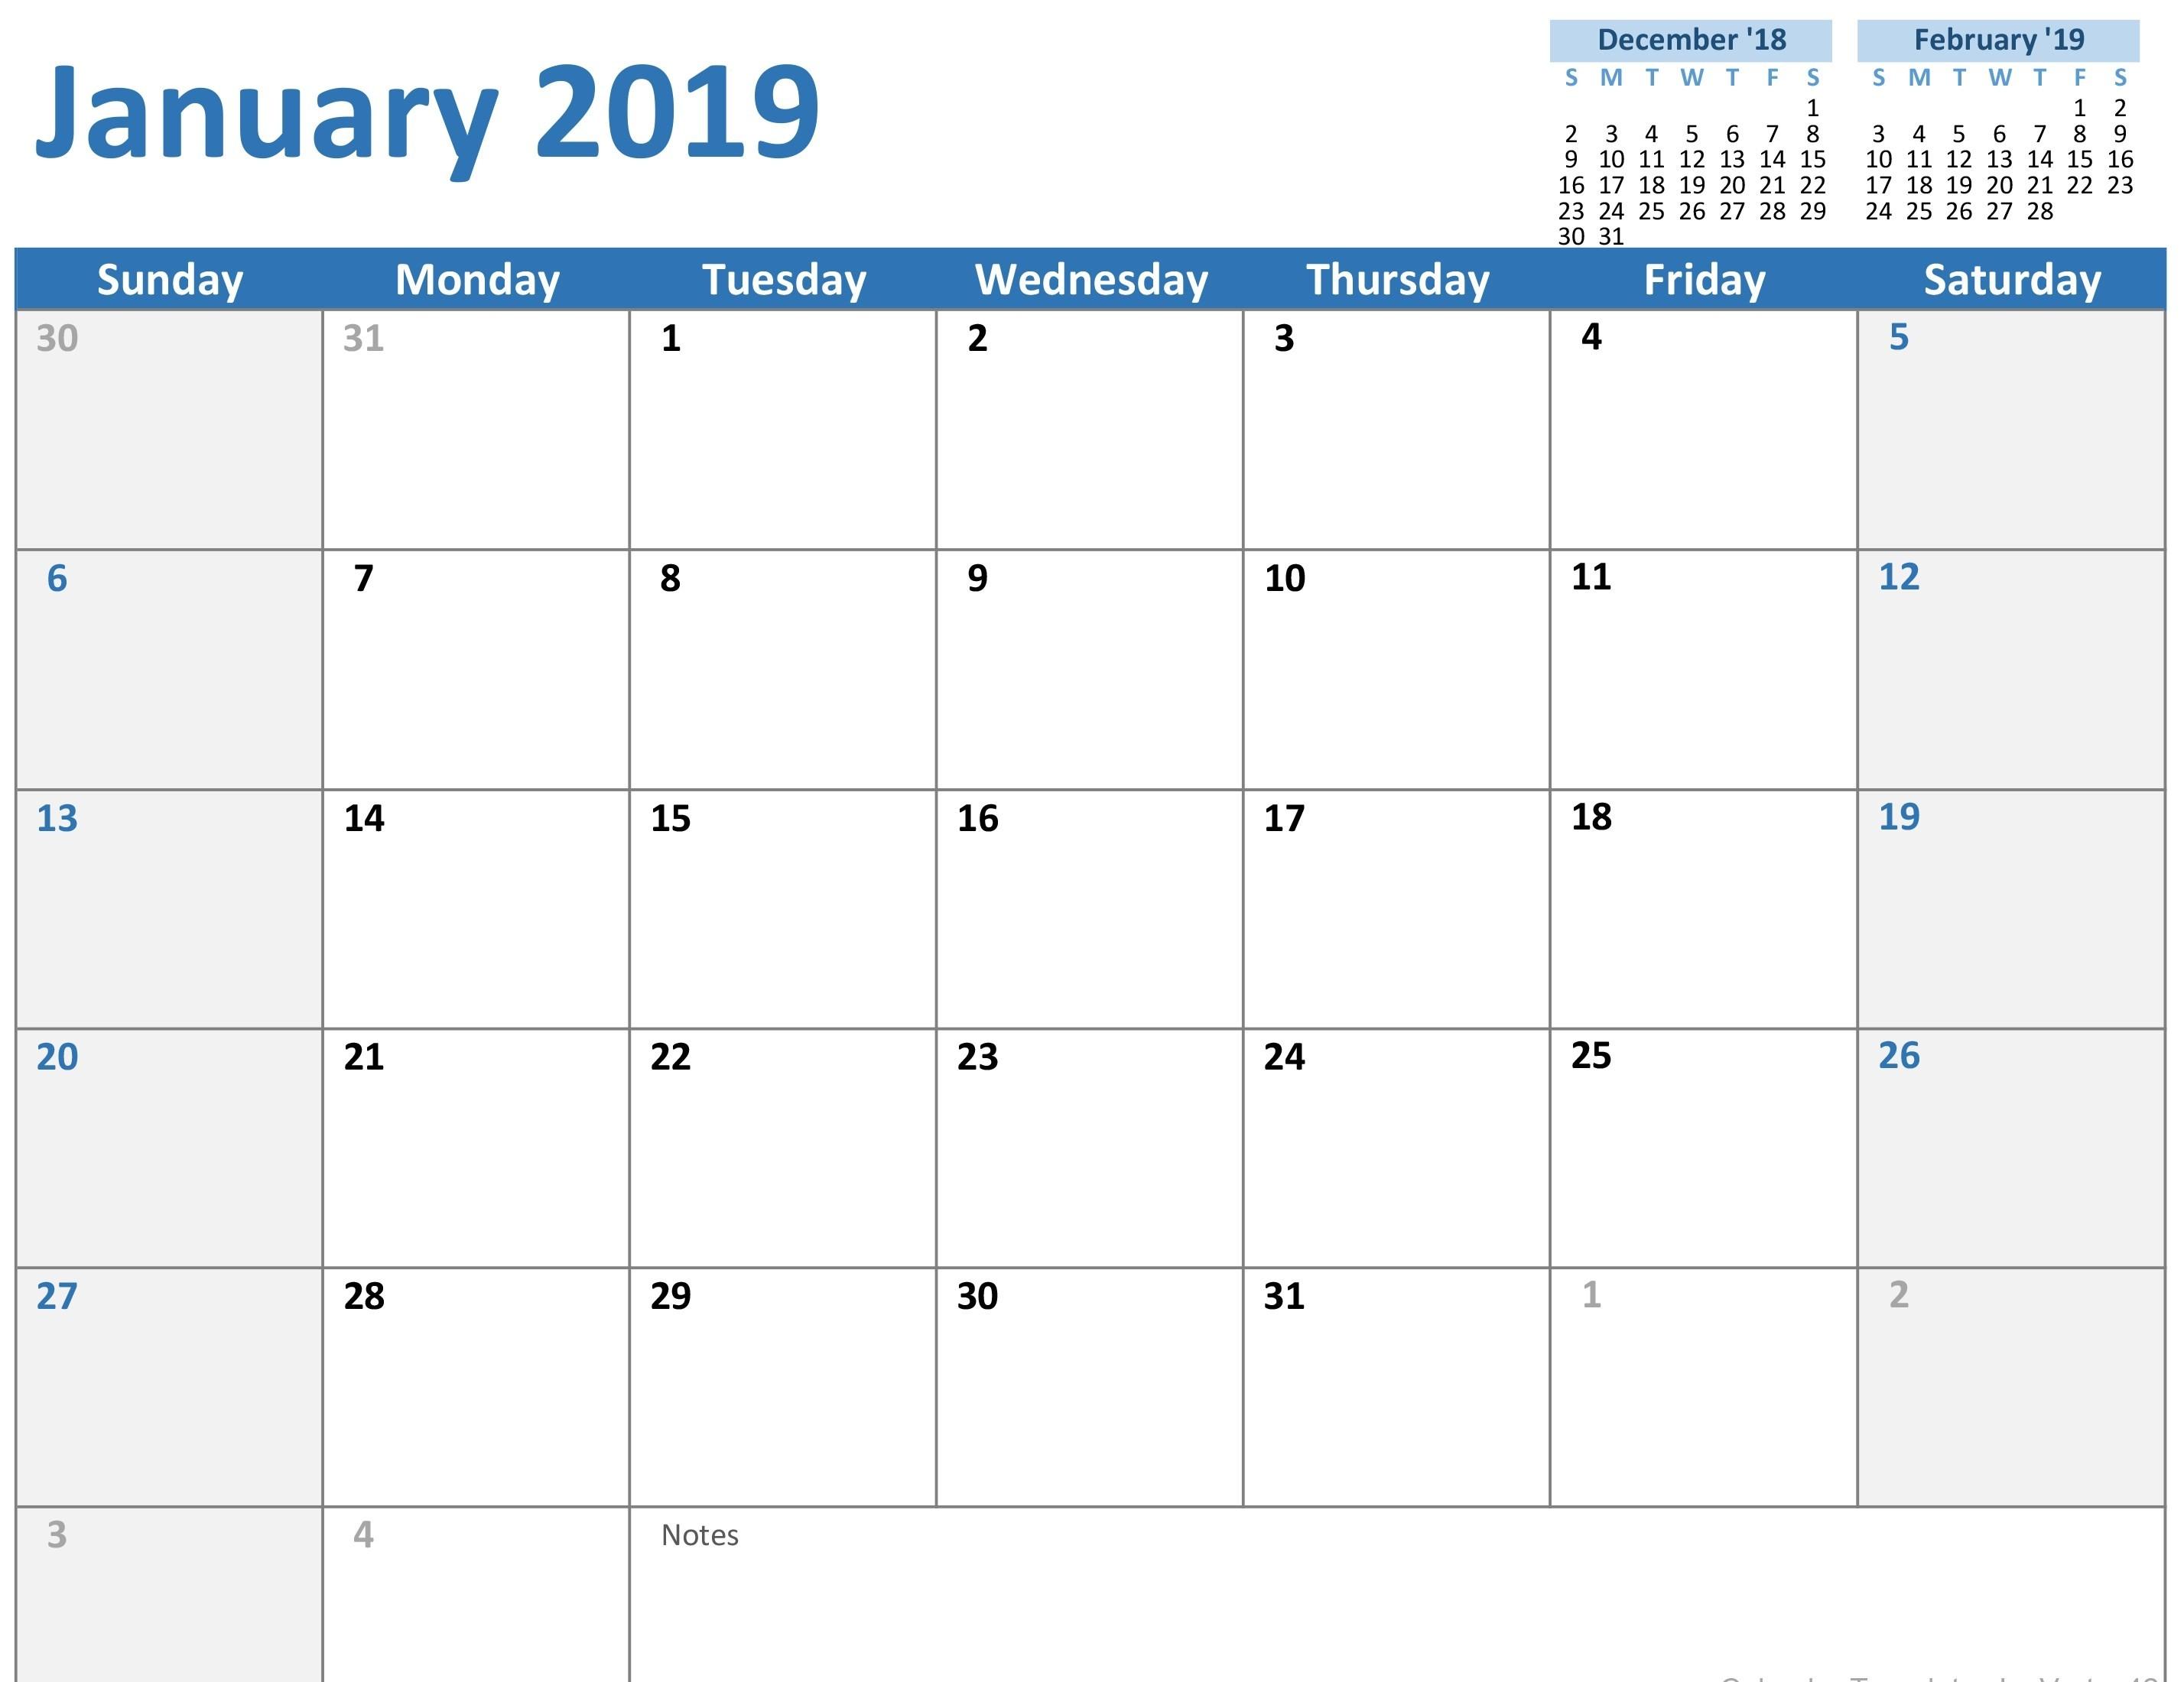 Calendar Templates For Microsoft Word - Wpa.wpart.co-Free Microsoft Word Calendar Template 2020